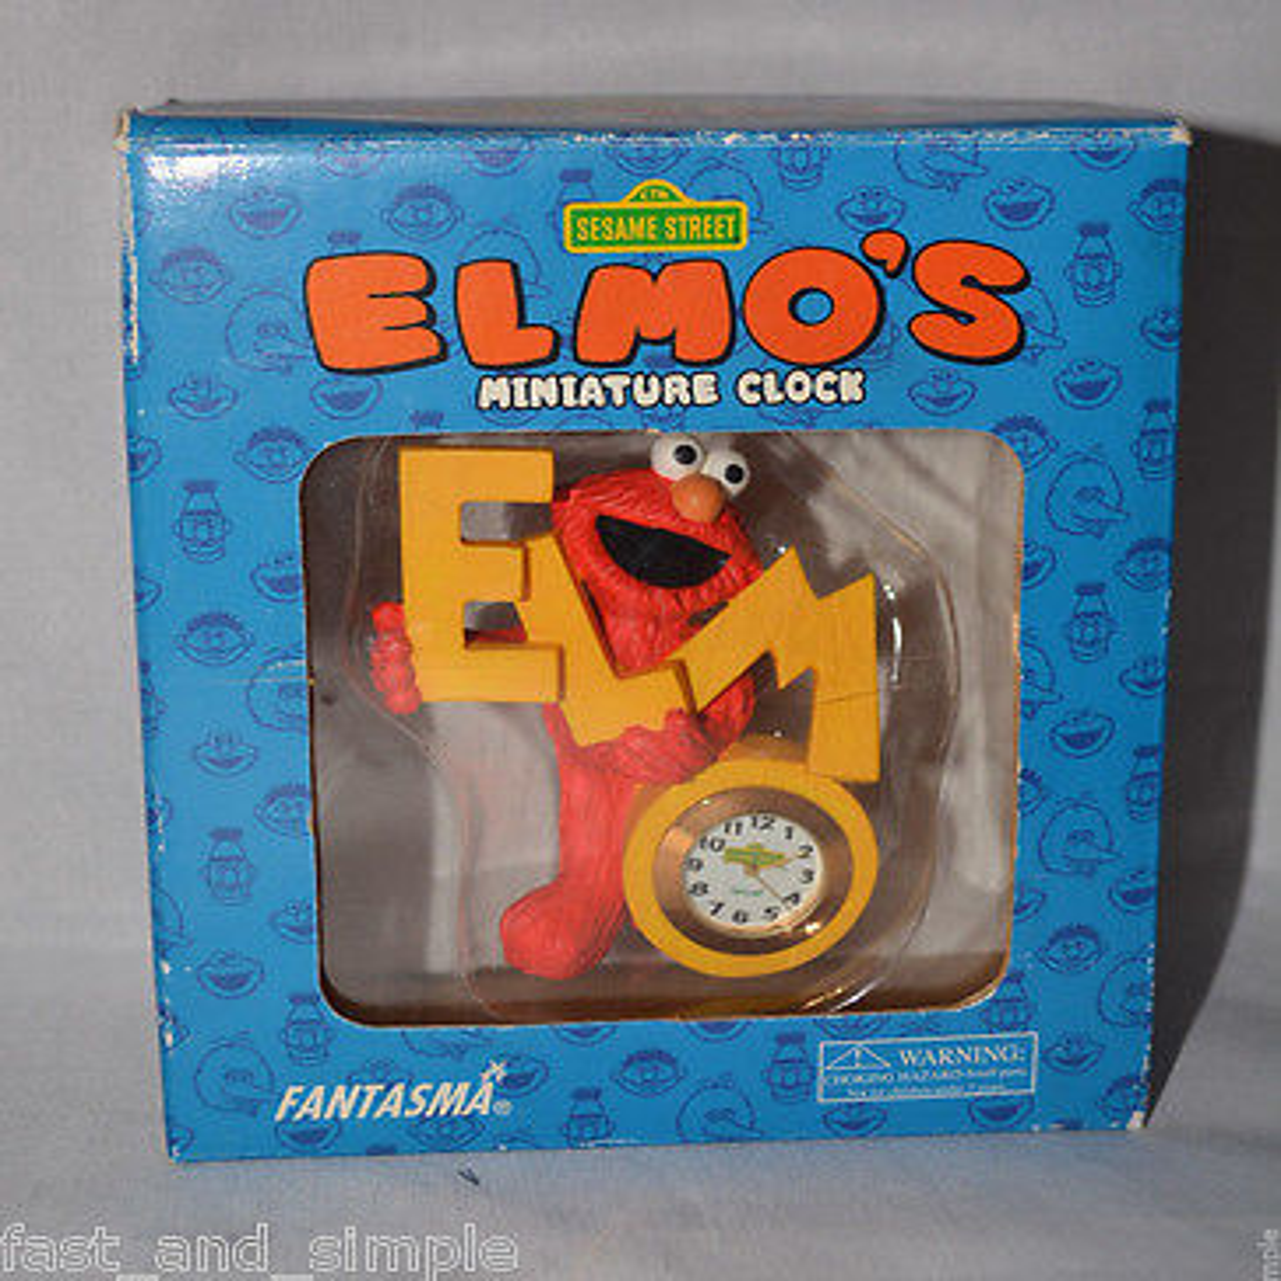 File:Elmos-Sesame-Street-Miniature-Clock-by-Fantasma.jpg